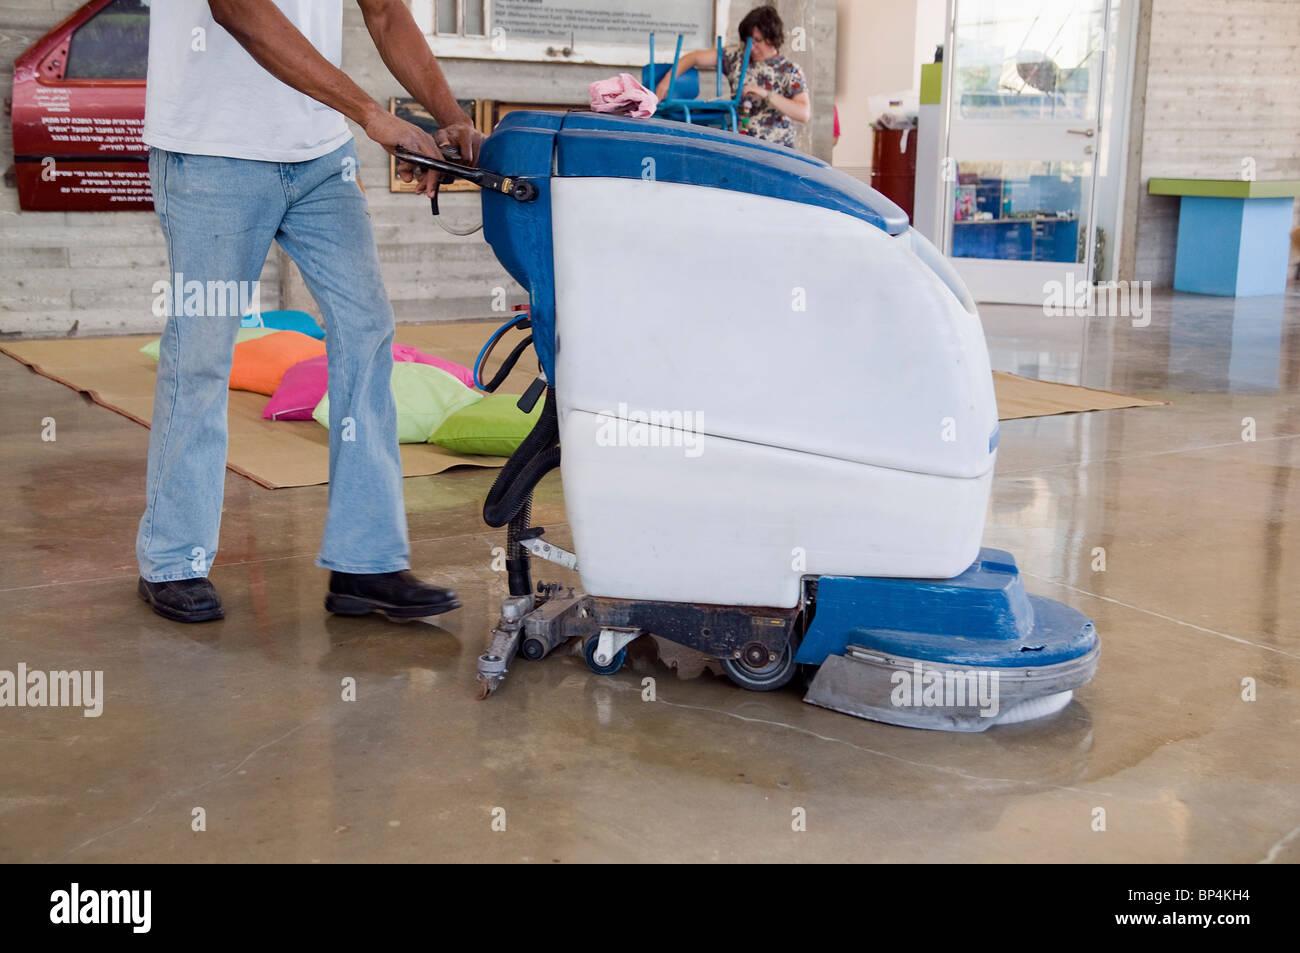 Man Operates A Floor Sweeper Vacuum Machine Stock Photo 30835984